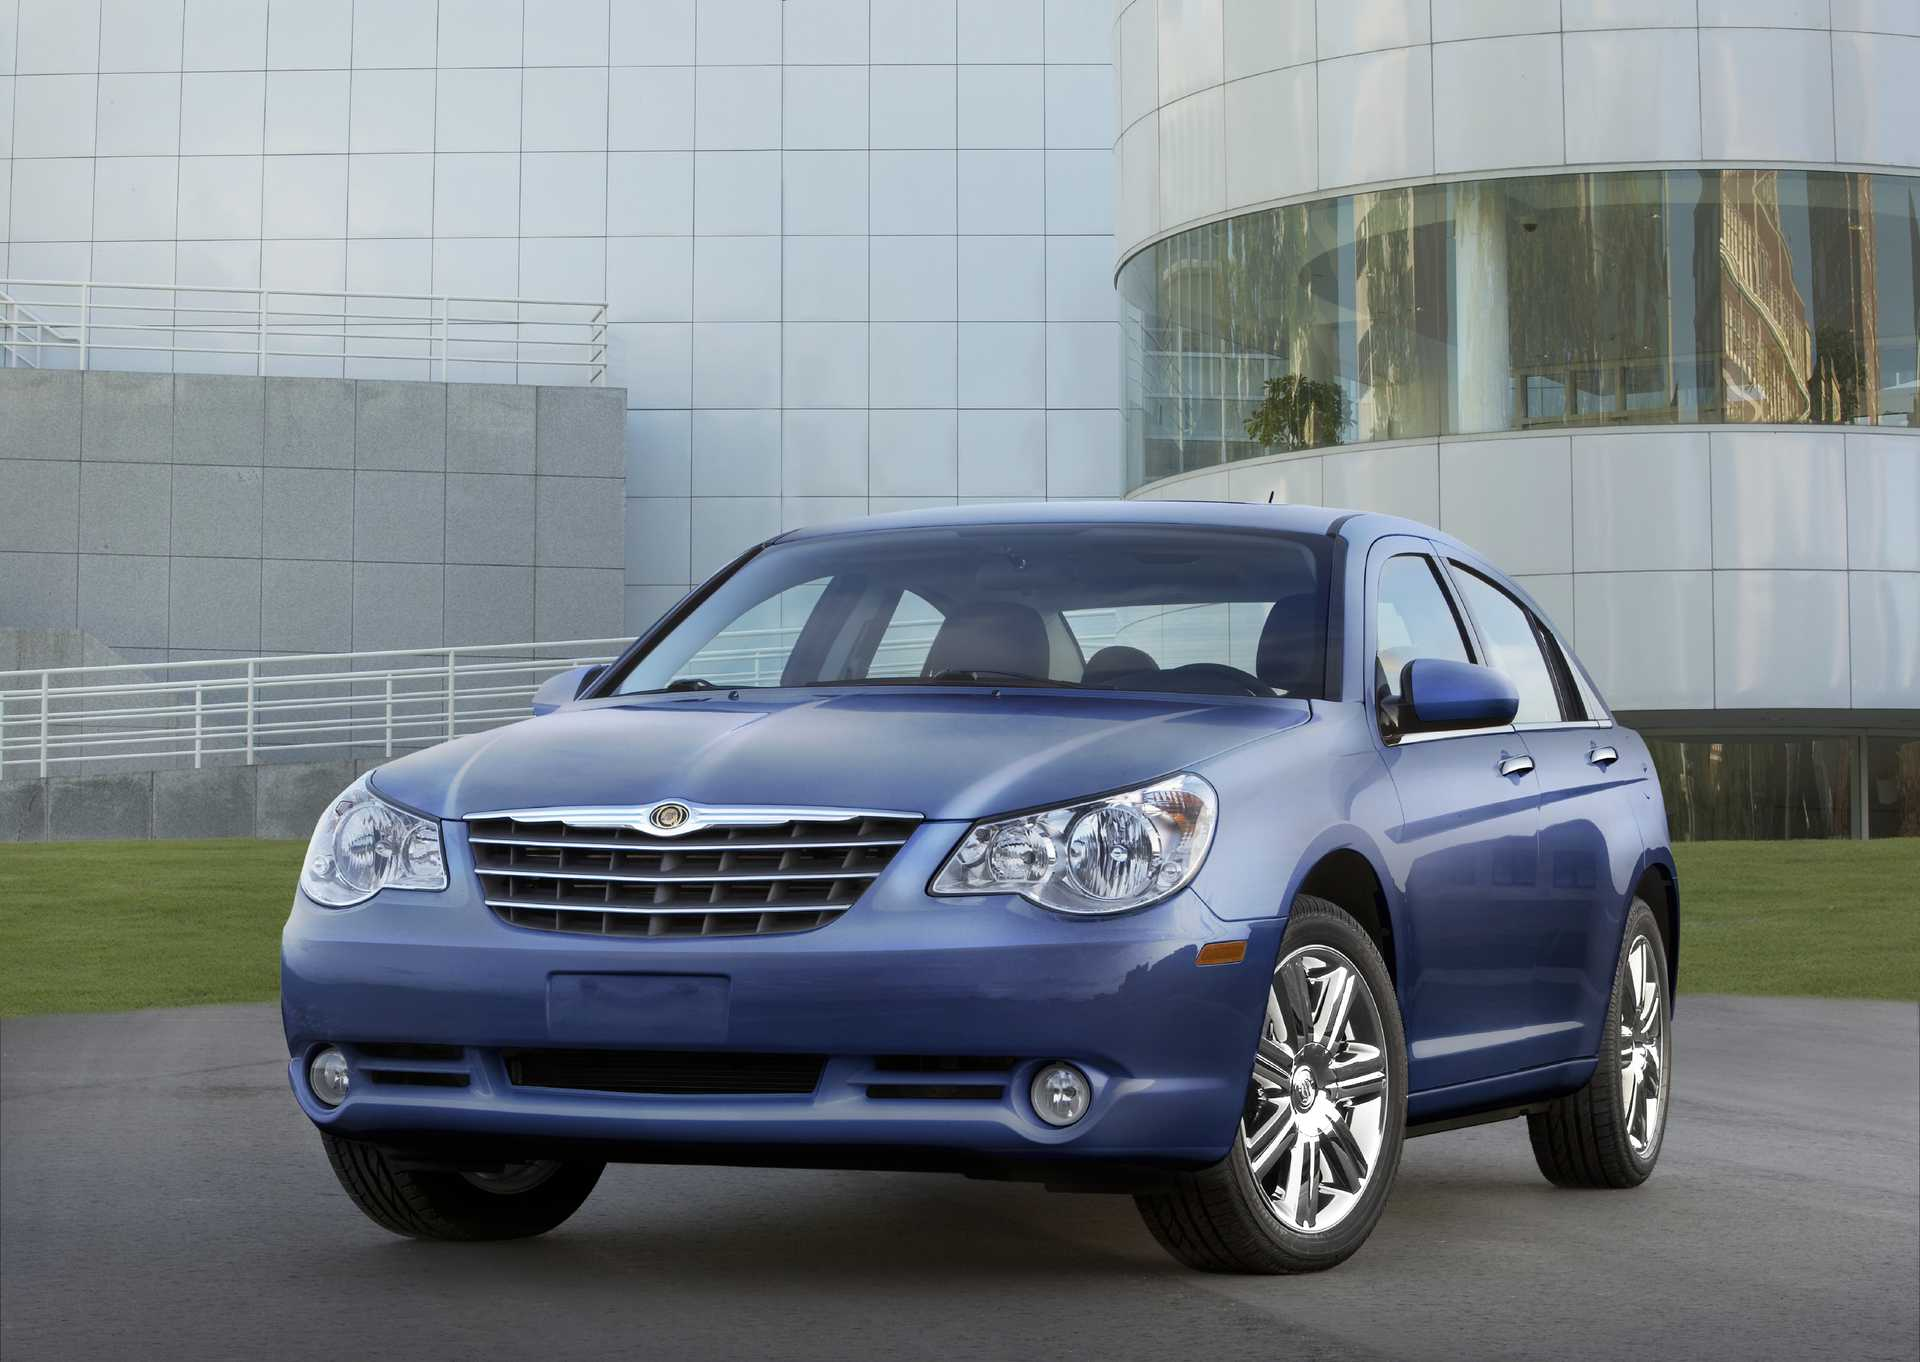 Chrysler Sebring Convertible 3.5 Automatic, 238hp, 2010